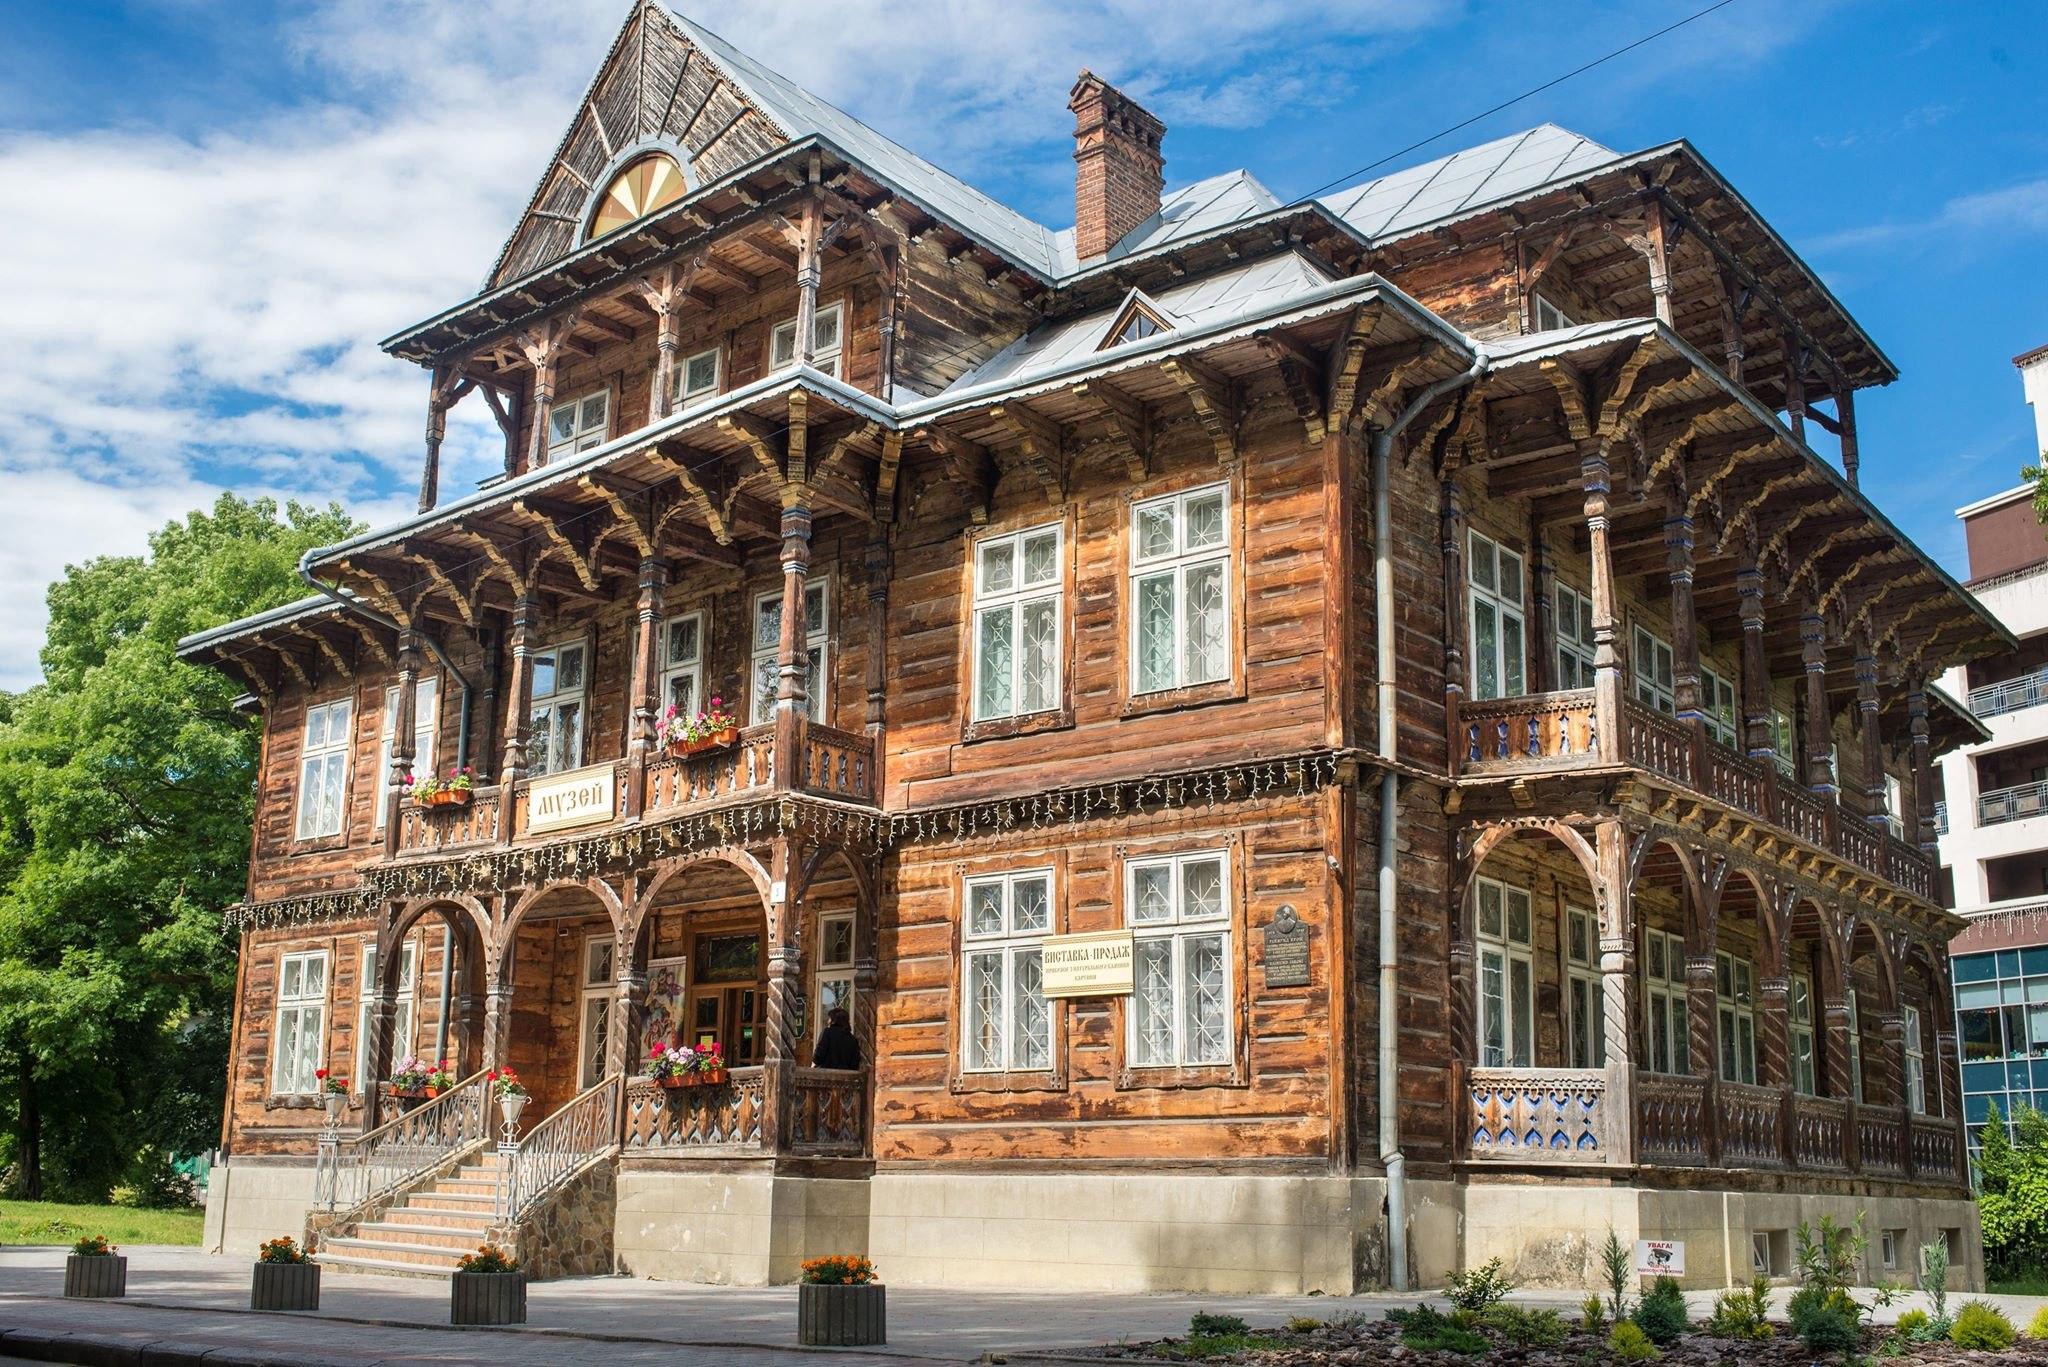 Трускавець, Львівська область